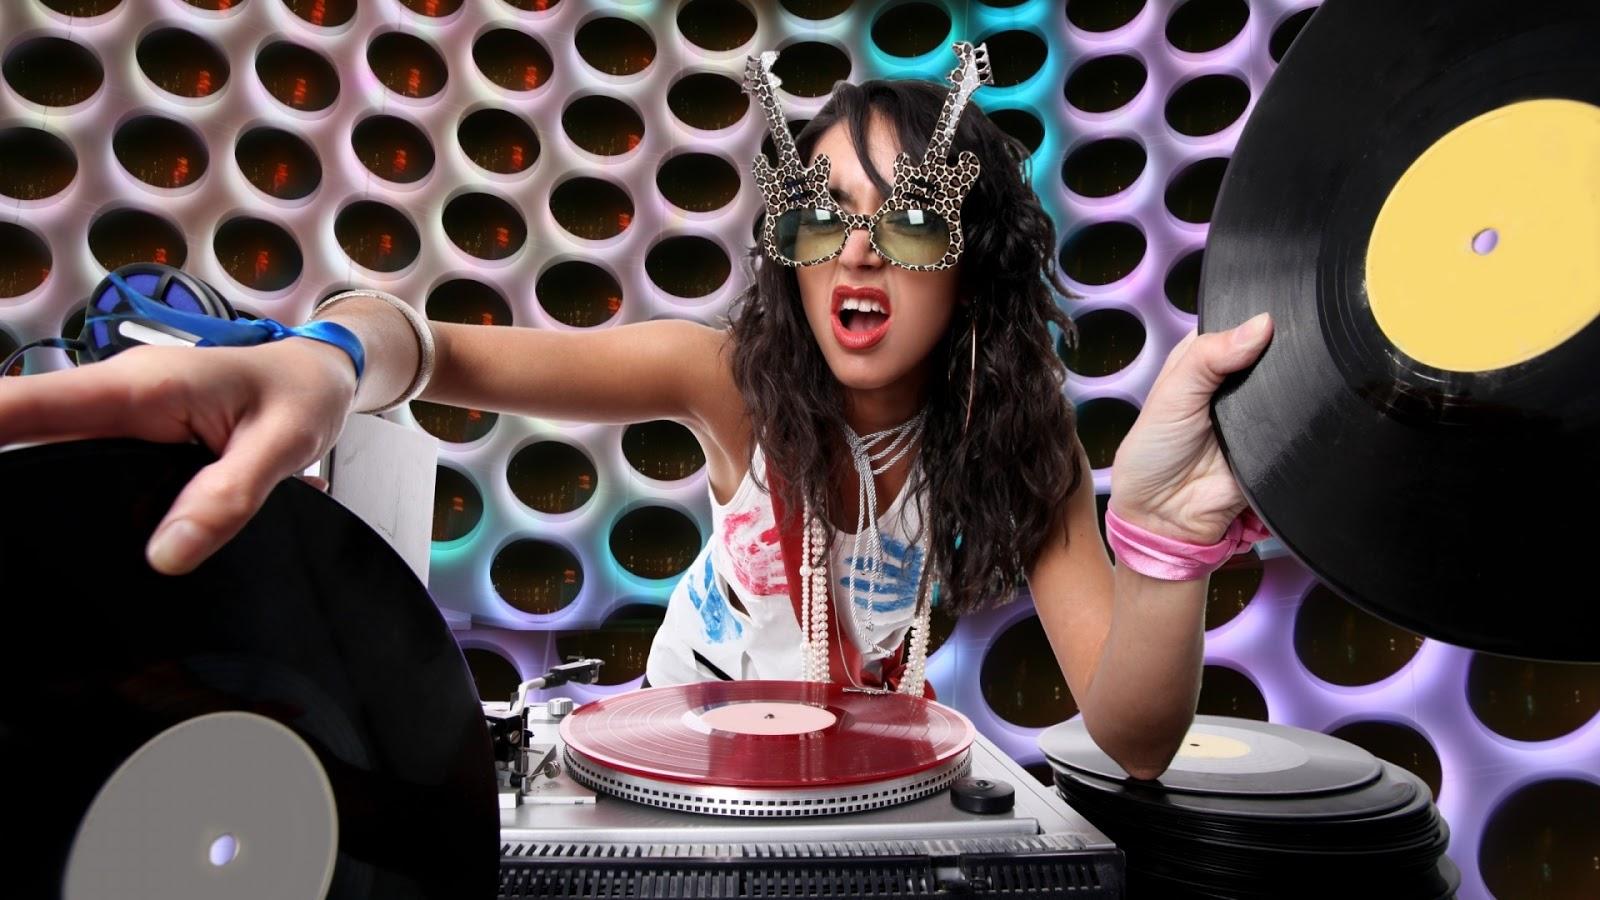 Funky DJ Girl Download 1920x1080 1600x900